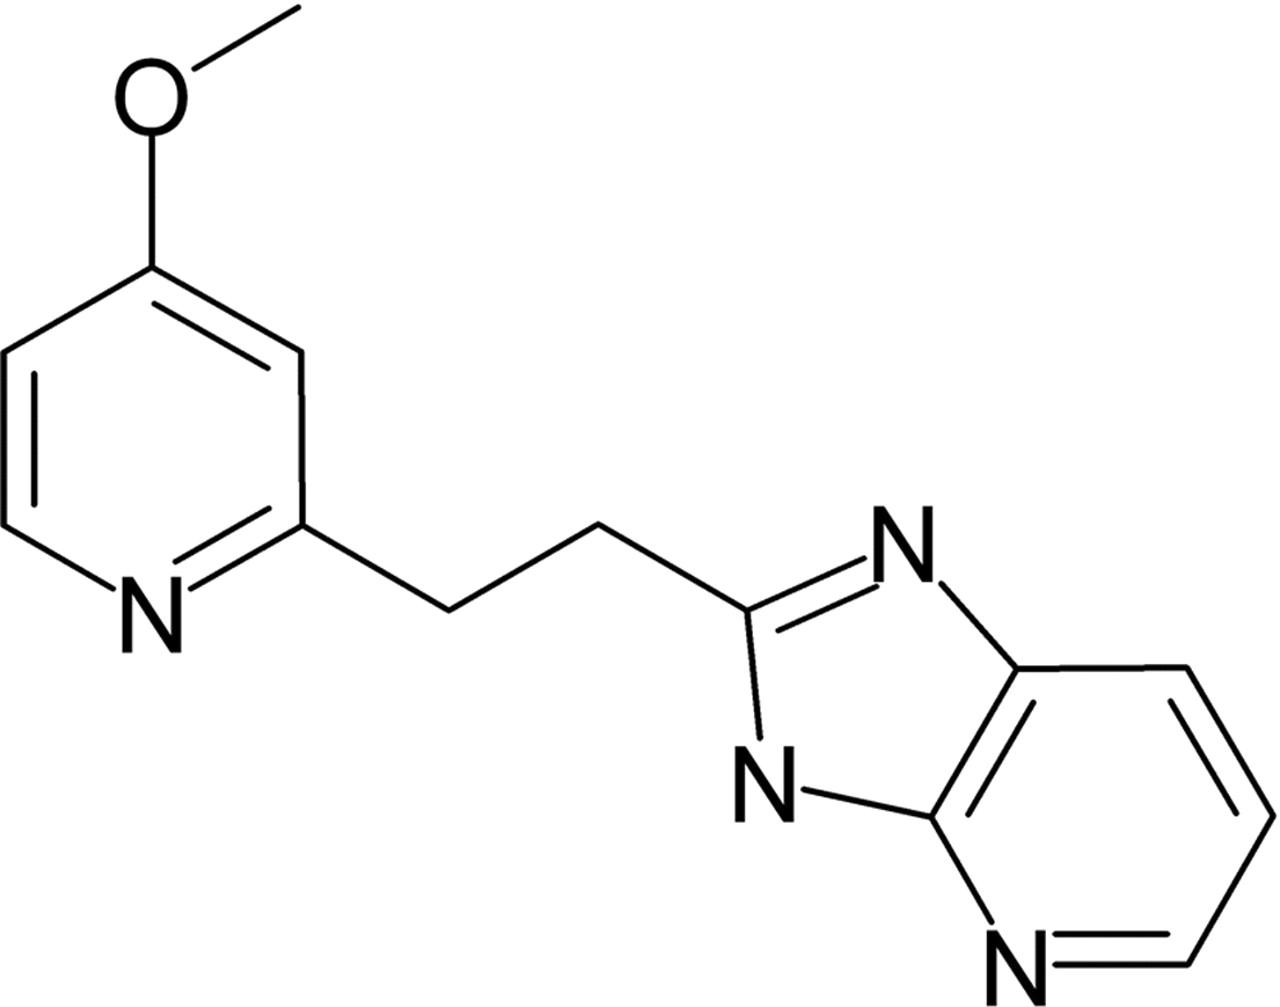 The Novel Imidazopyridine 2-[2-(4-Methoxy-pyridin-2-yl